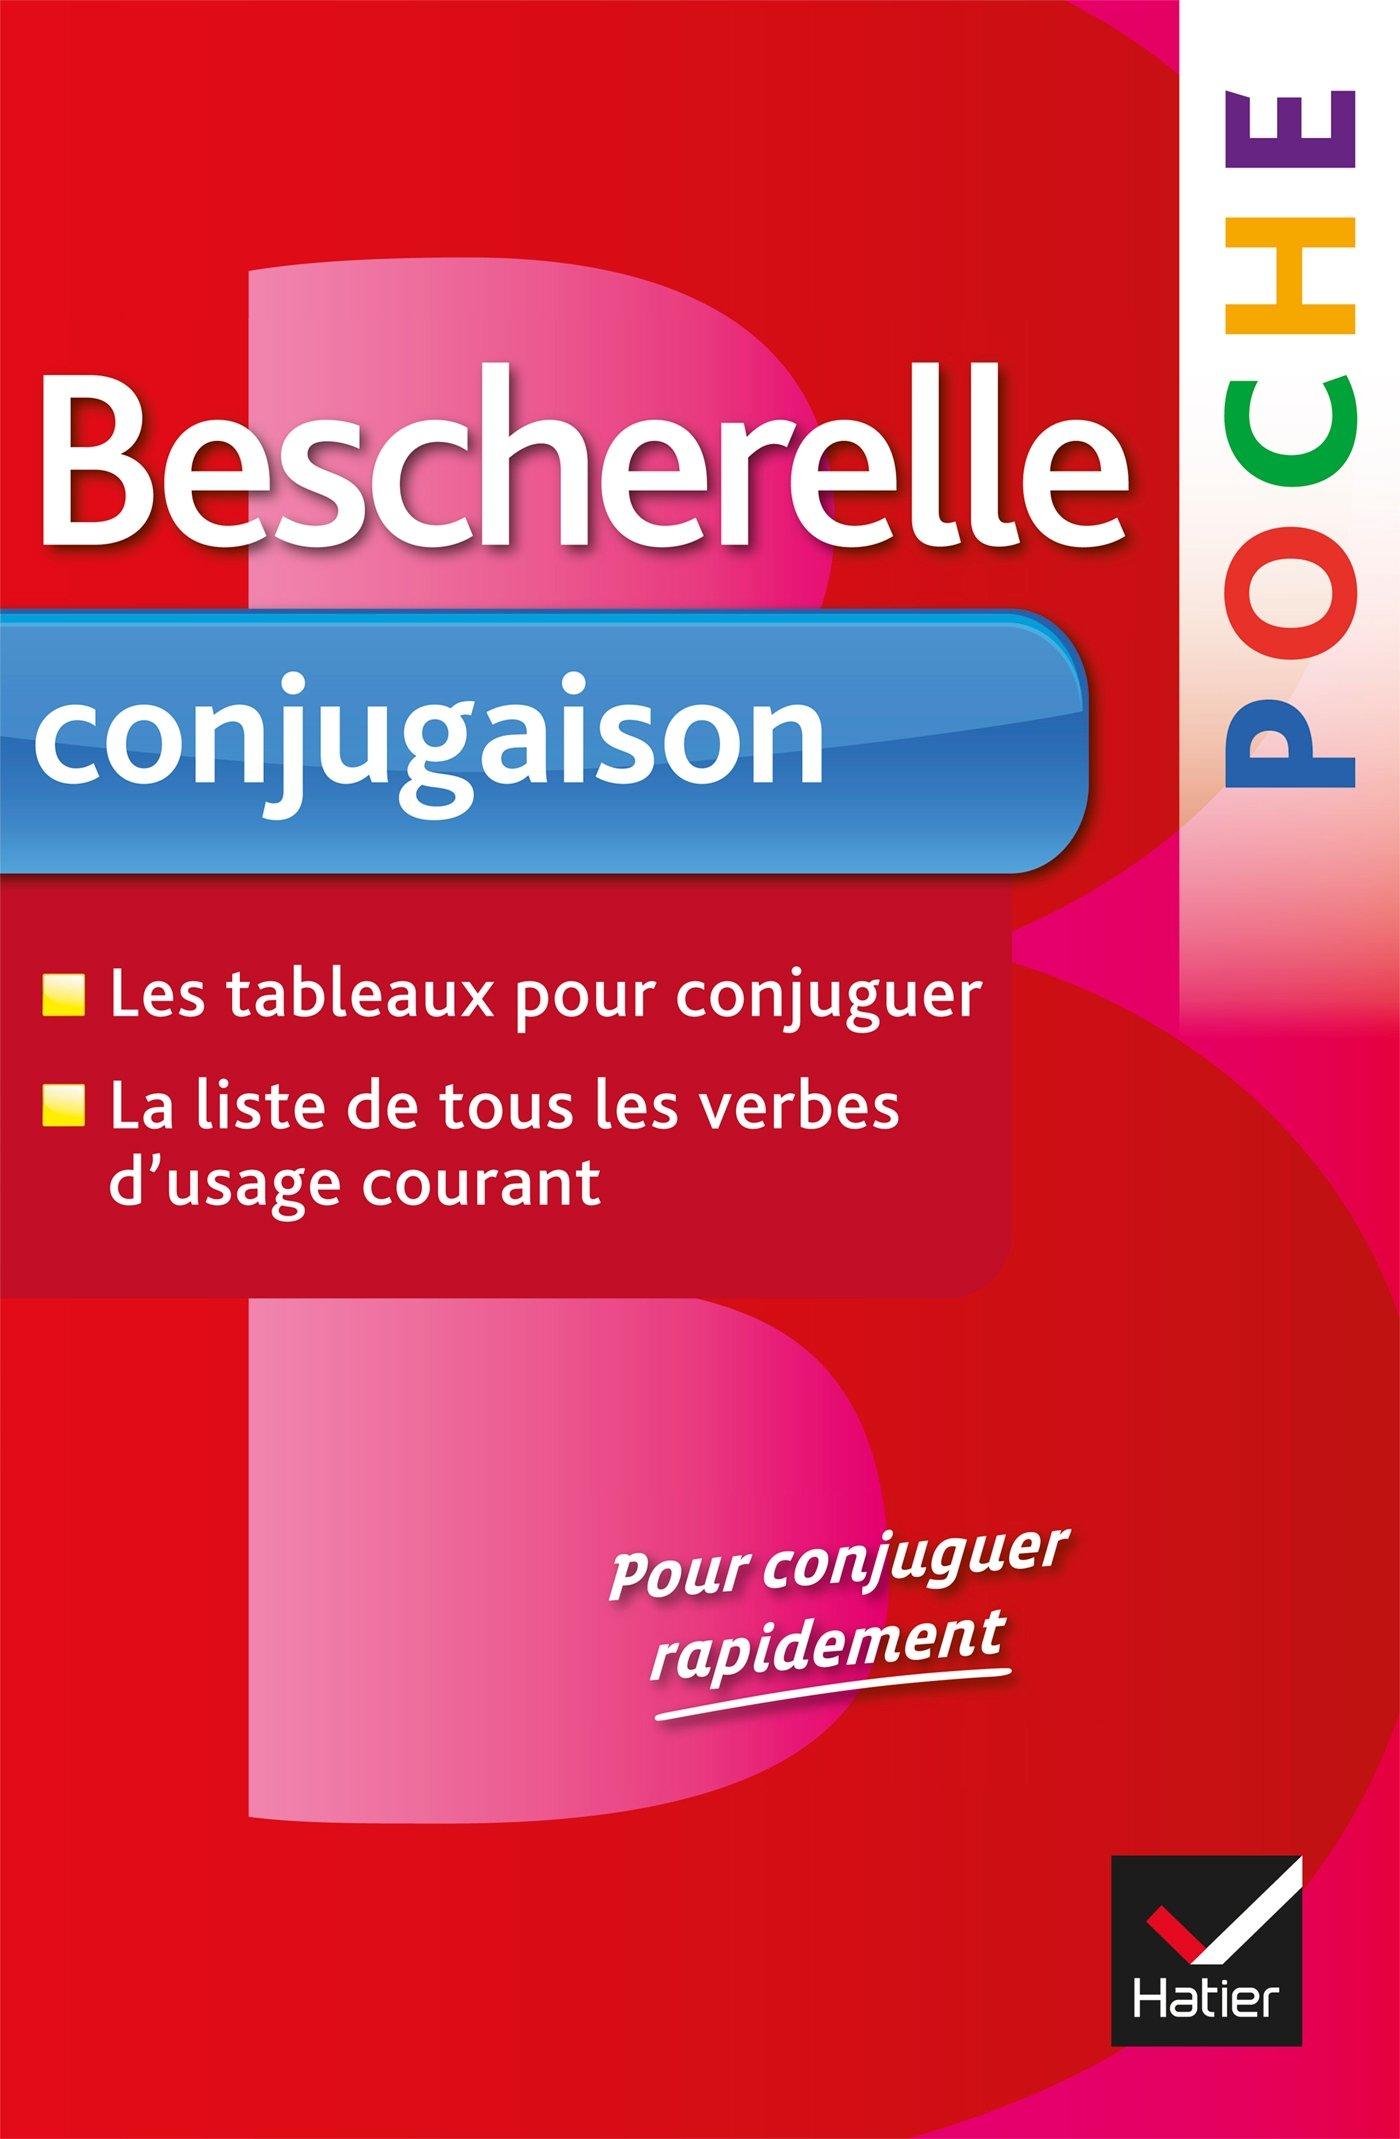 Bescherelle poche Conjugaison (Collection Bescherelle Poche)